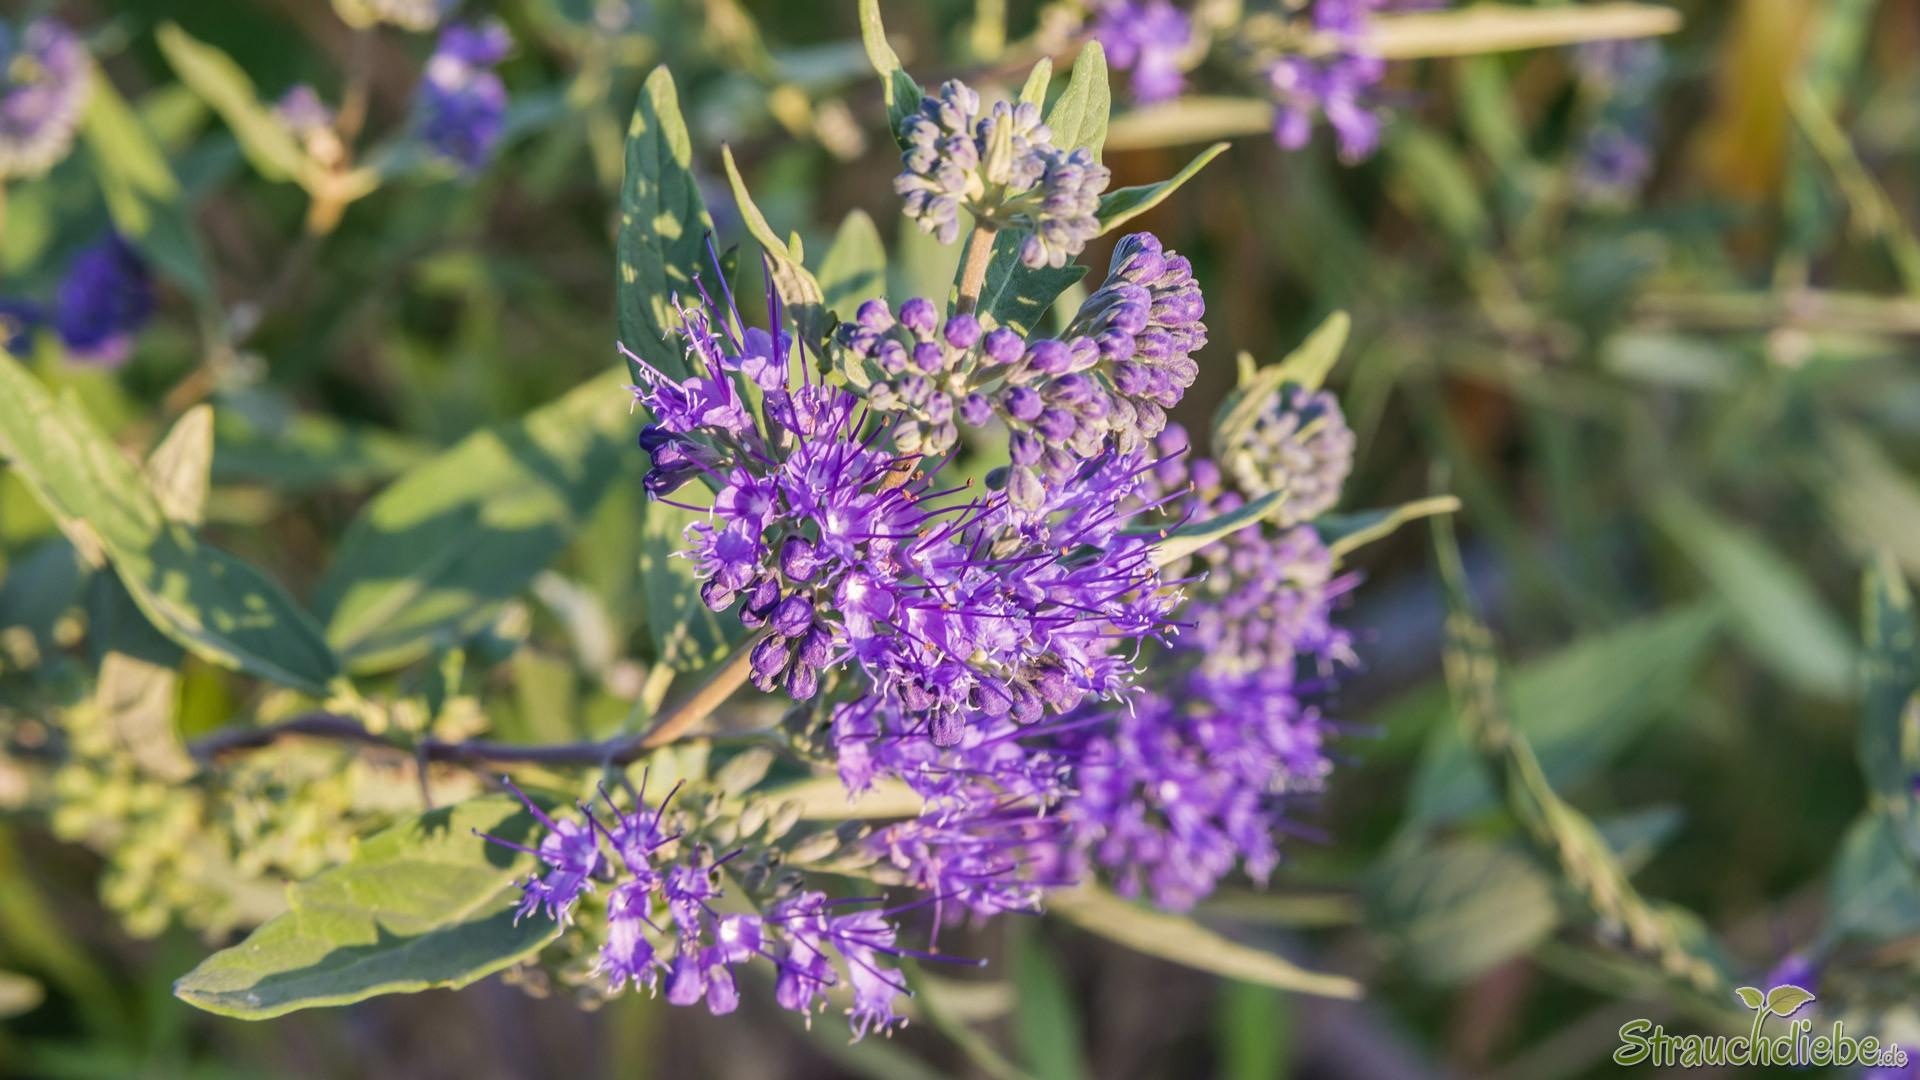 Clandon-Bartblume (Caryopteris x clandonensis)